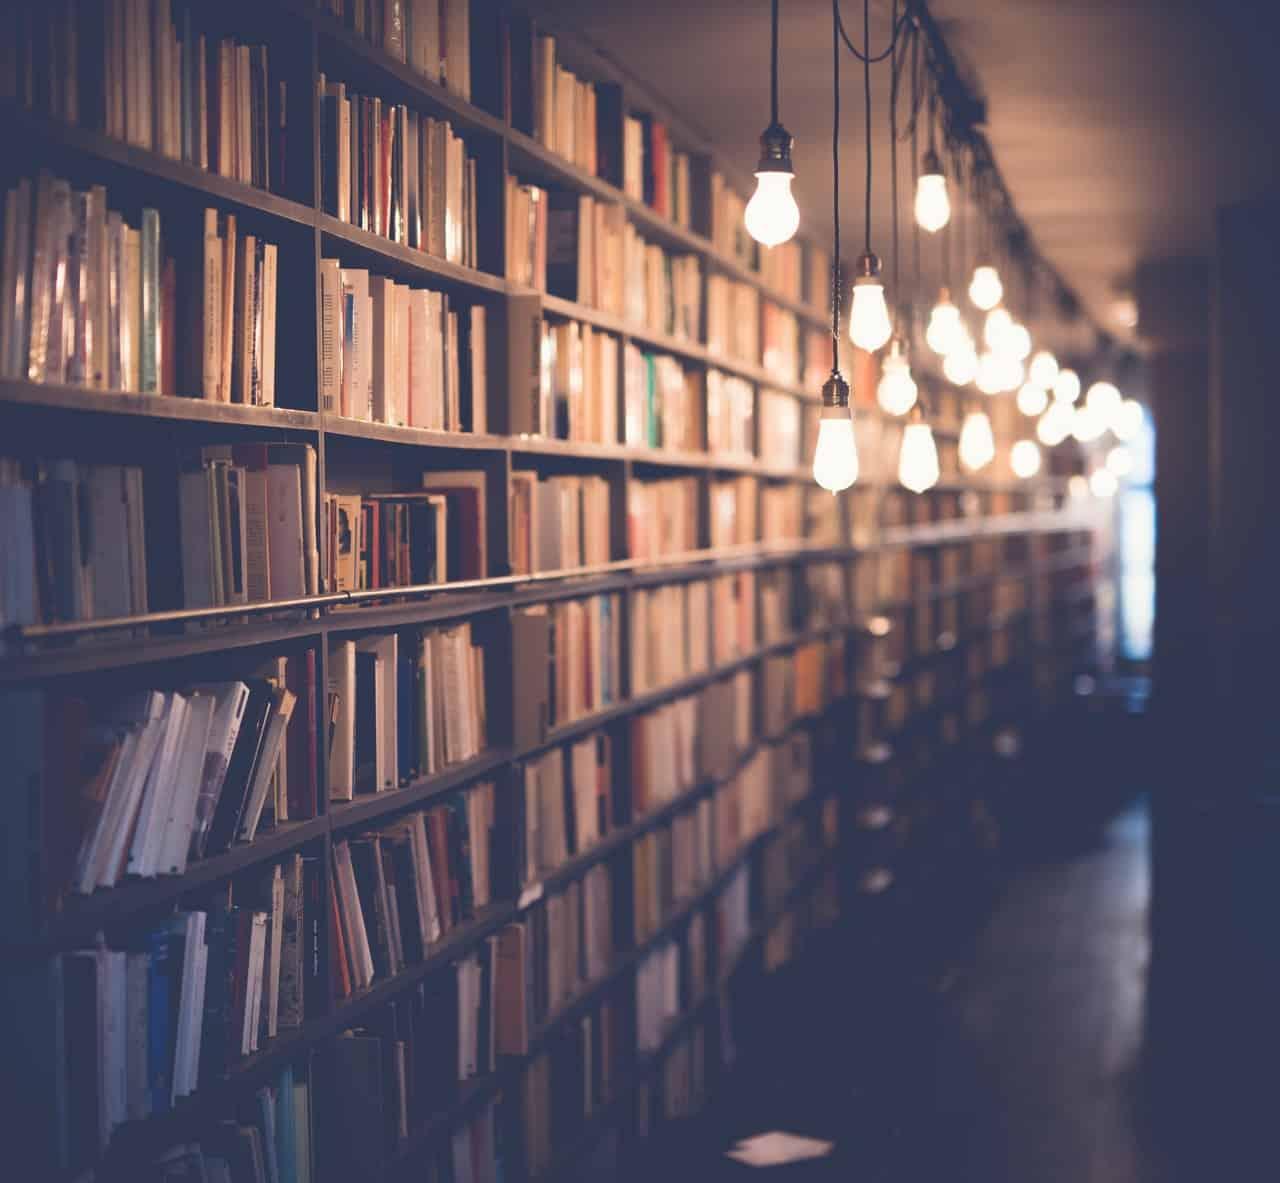 blur-book-stack-books-bookshelves